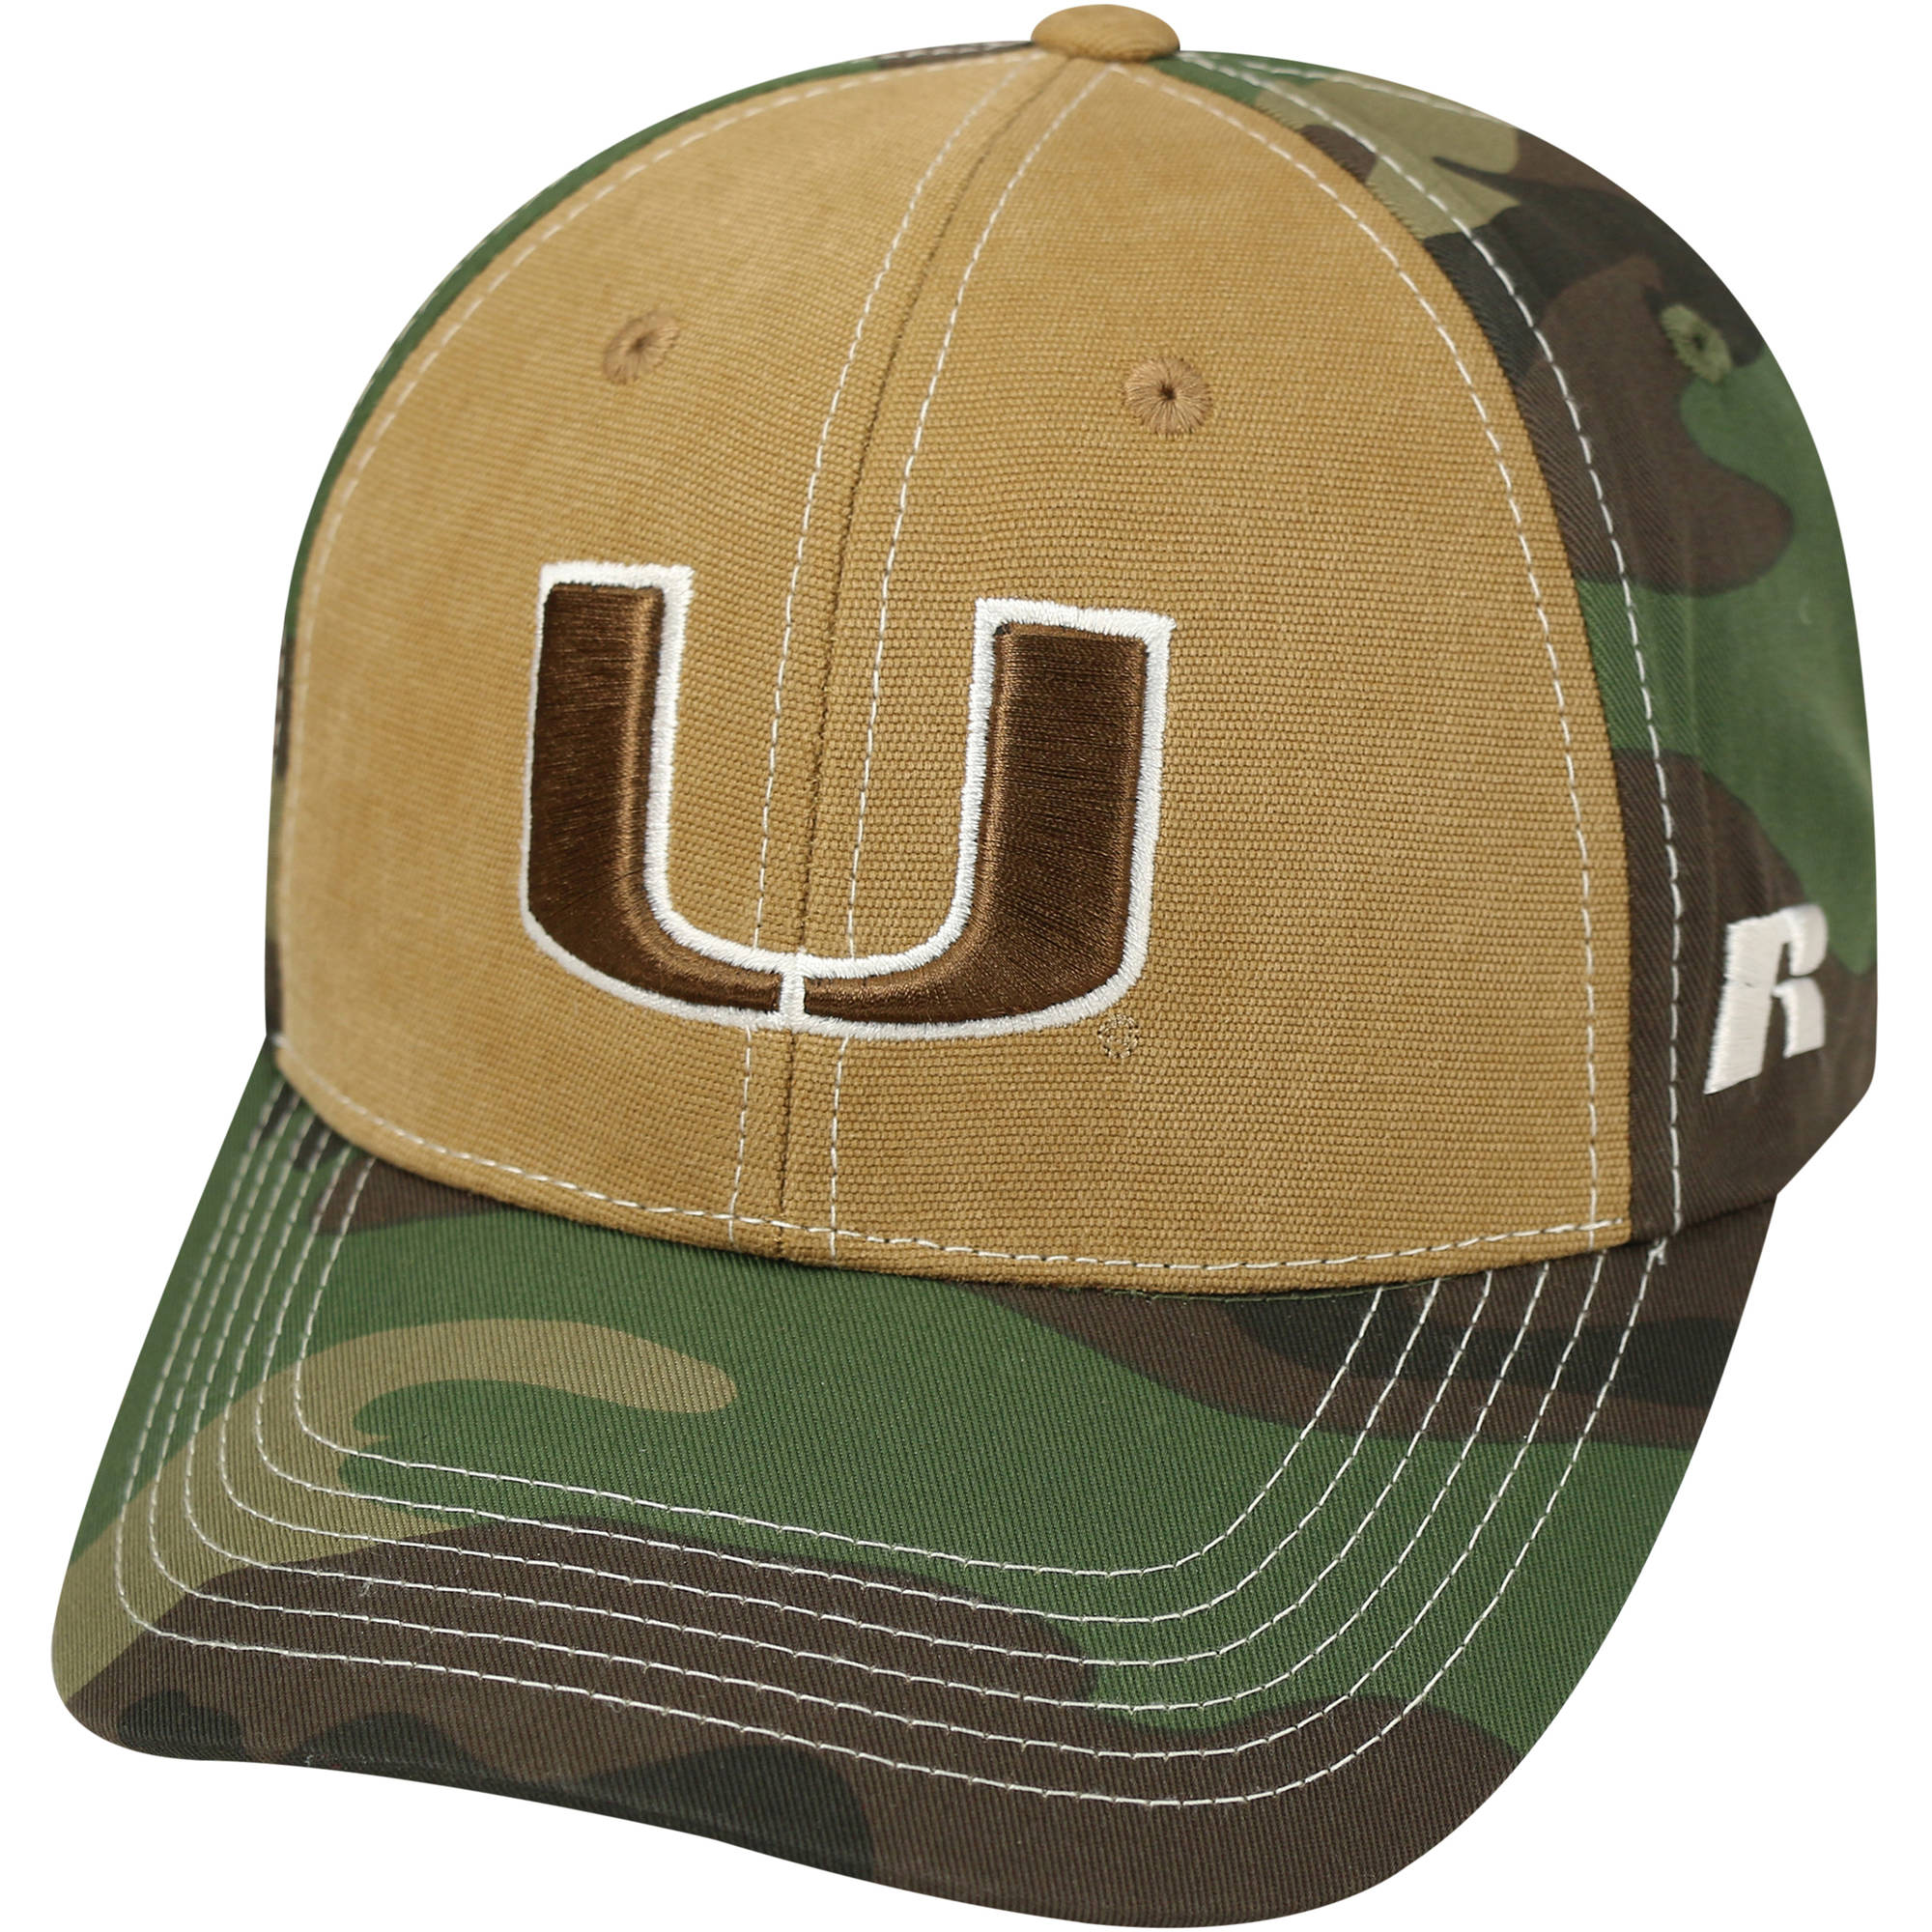 ... low price university of miami hurricanes mossy baseball cap d89b2 f392d 2e8ae79e26a9